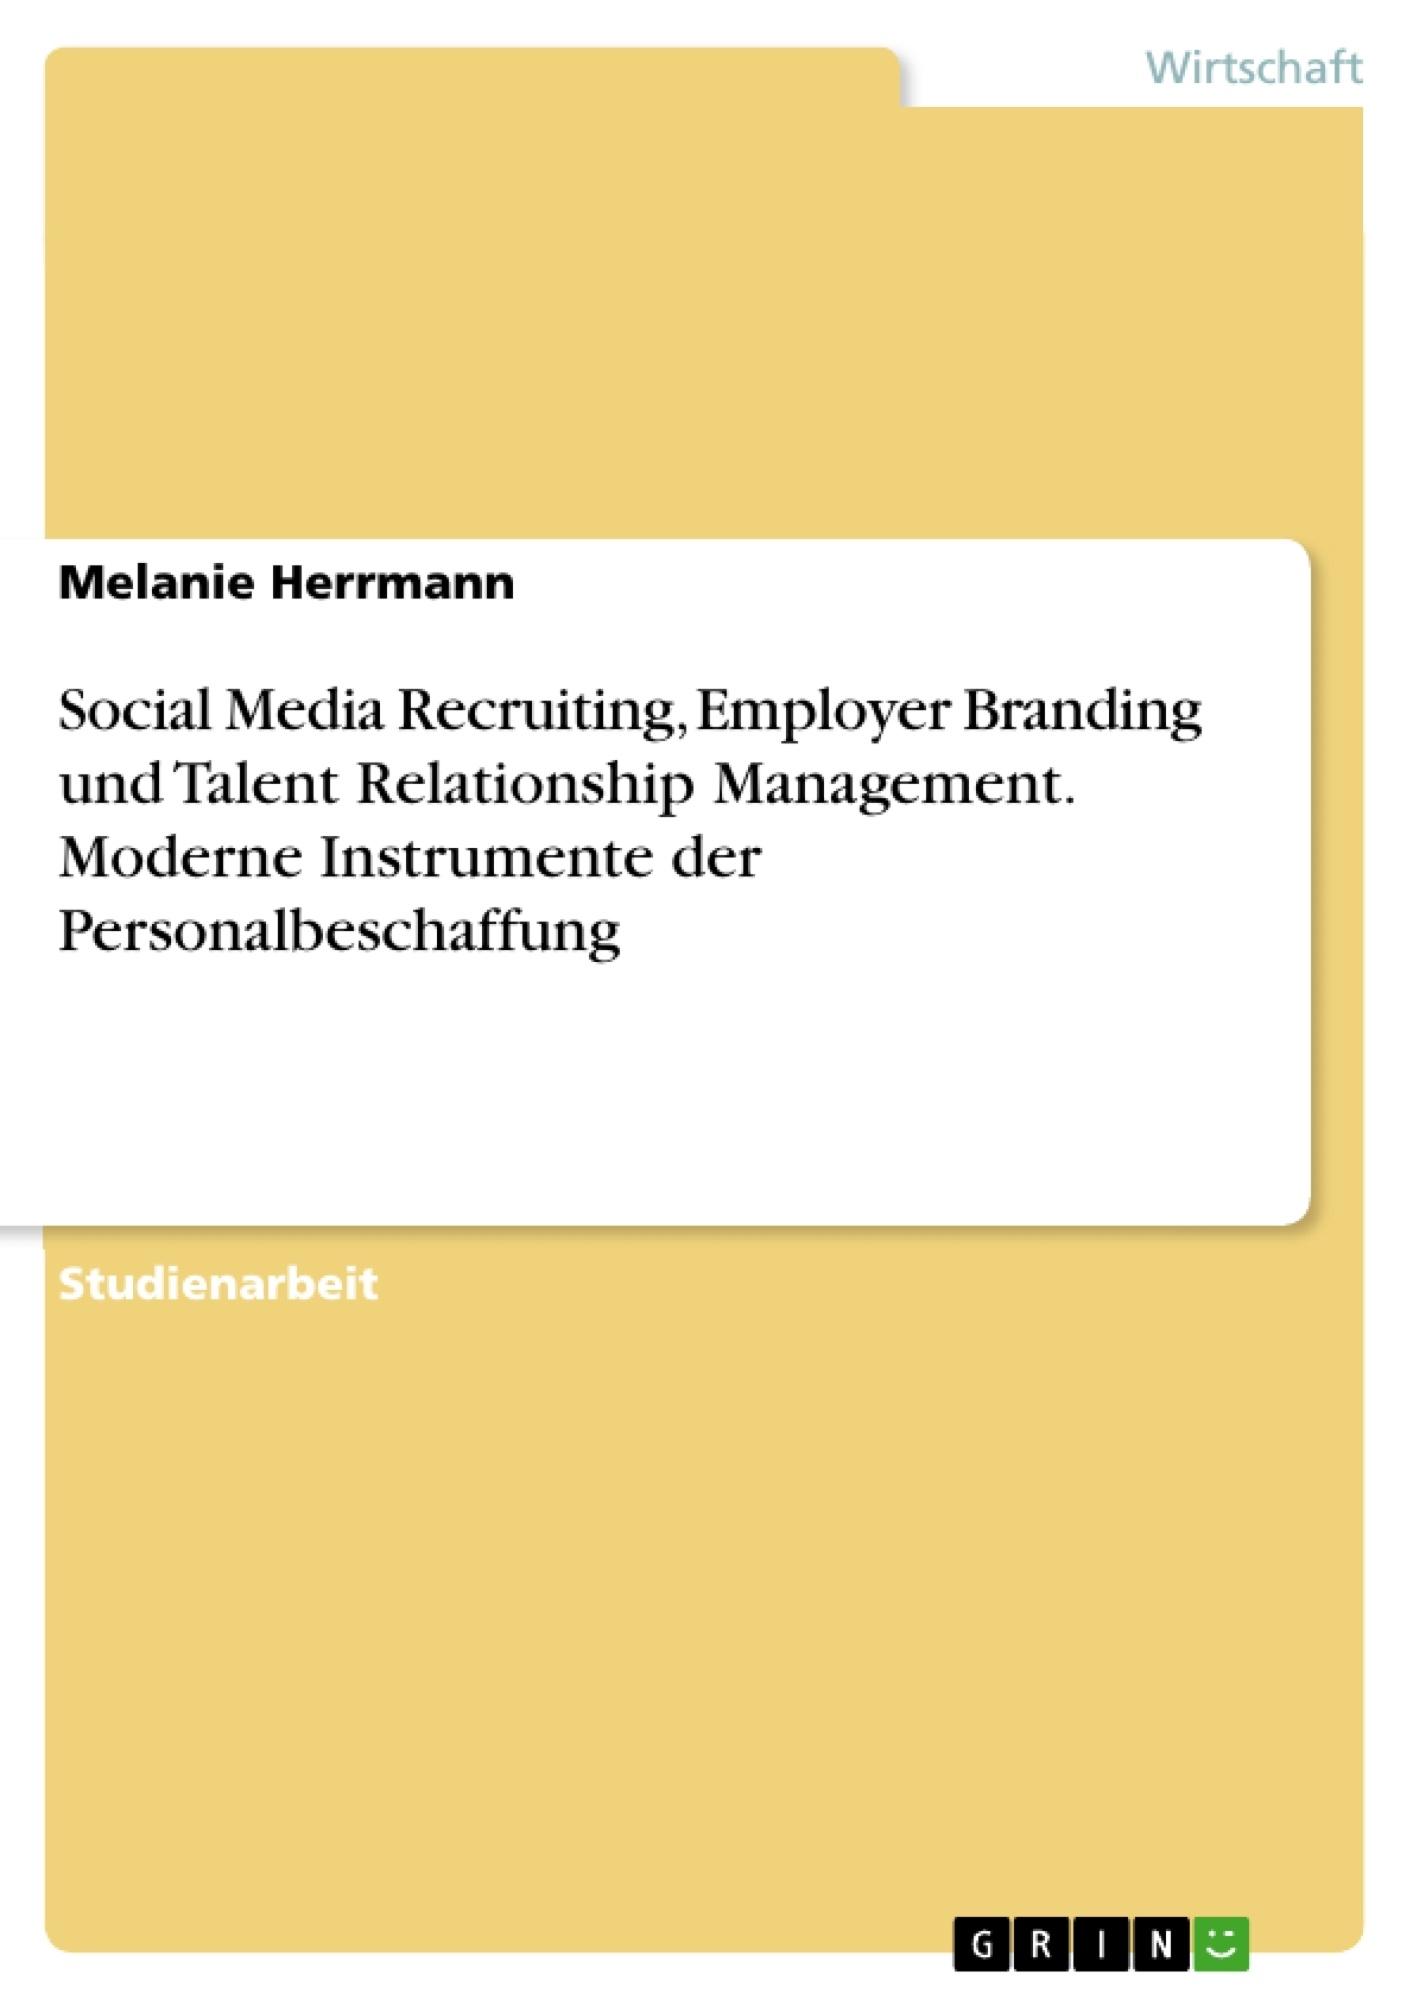 Titel: Social Media Recruiting, Employer Branding und Talent Relationship Management. Moderne Instrumente der Personalbeschaffung